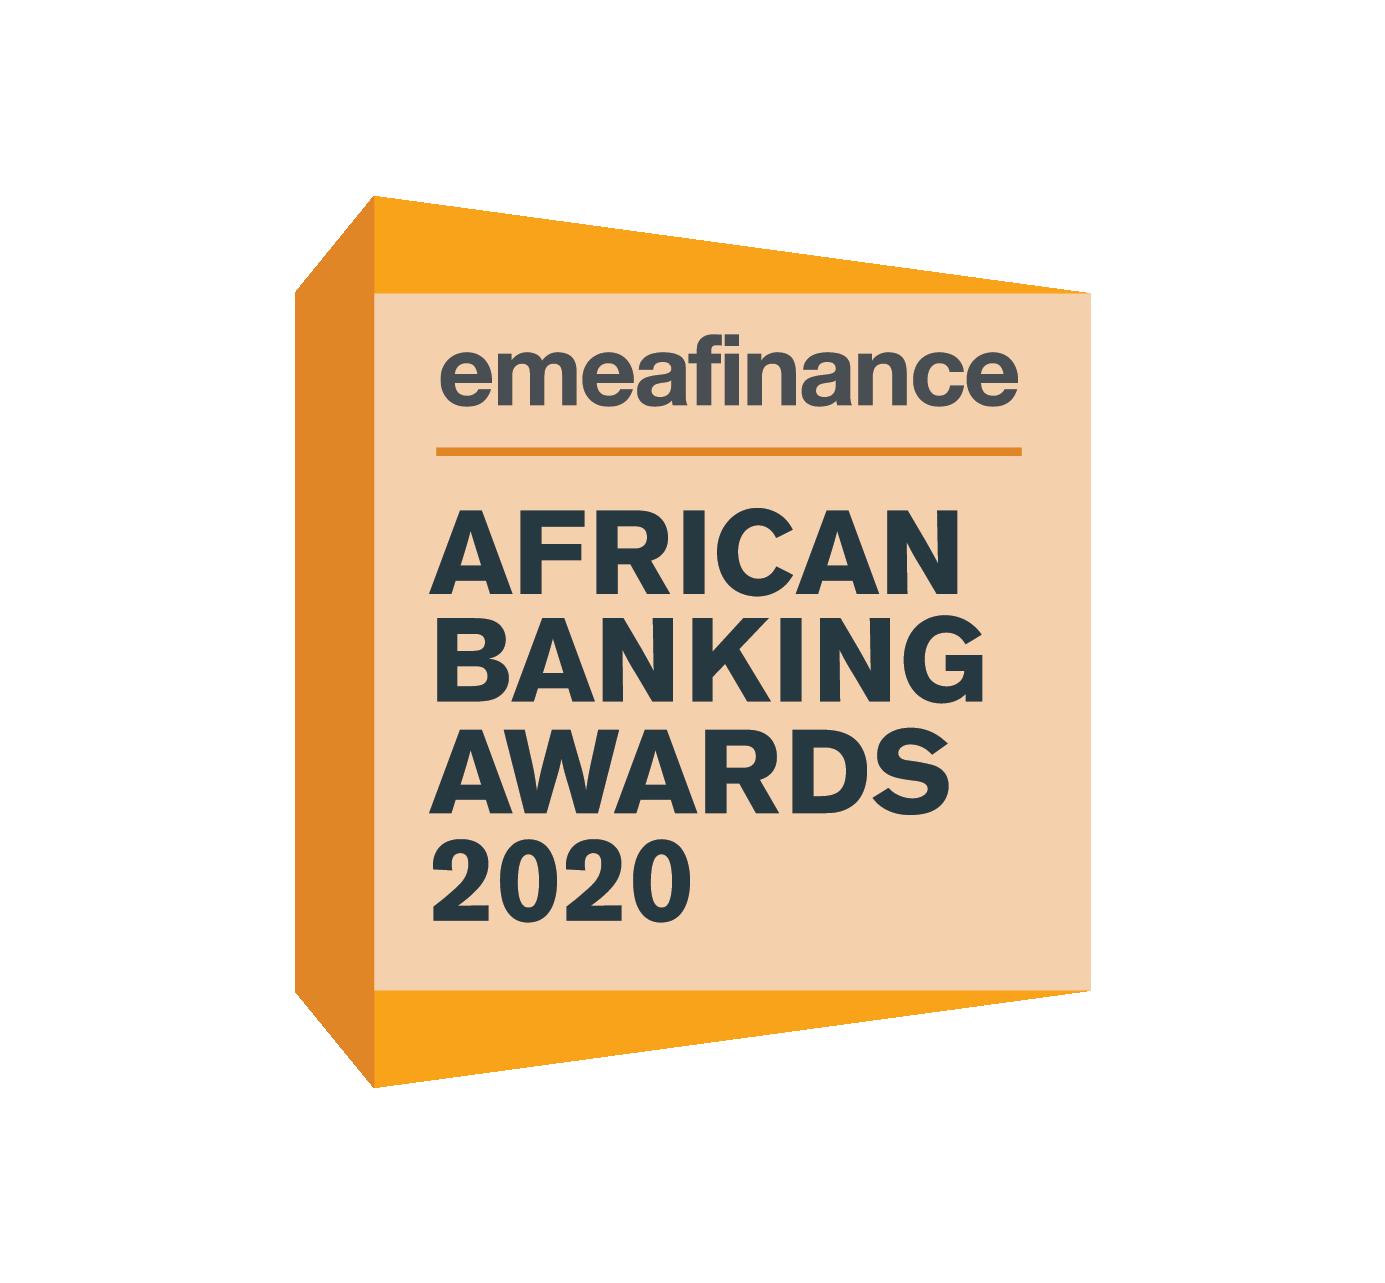 Emea_African_Award_2020